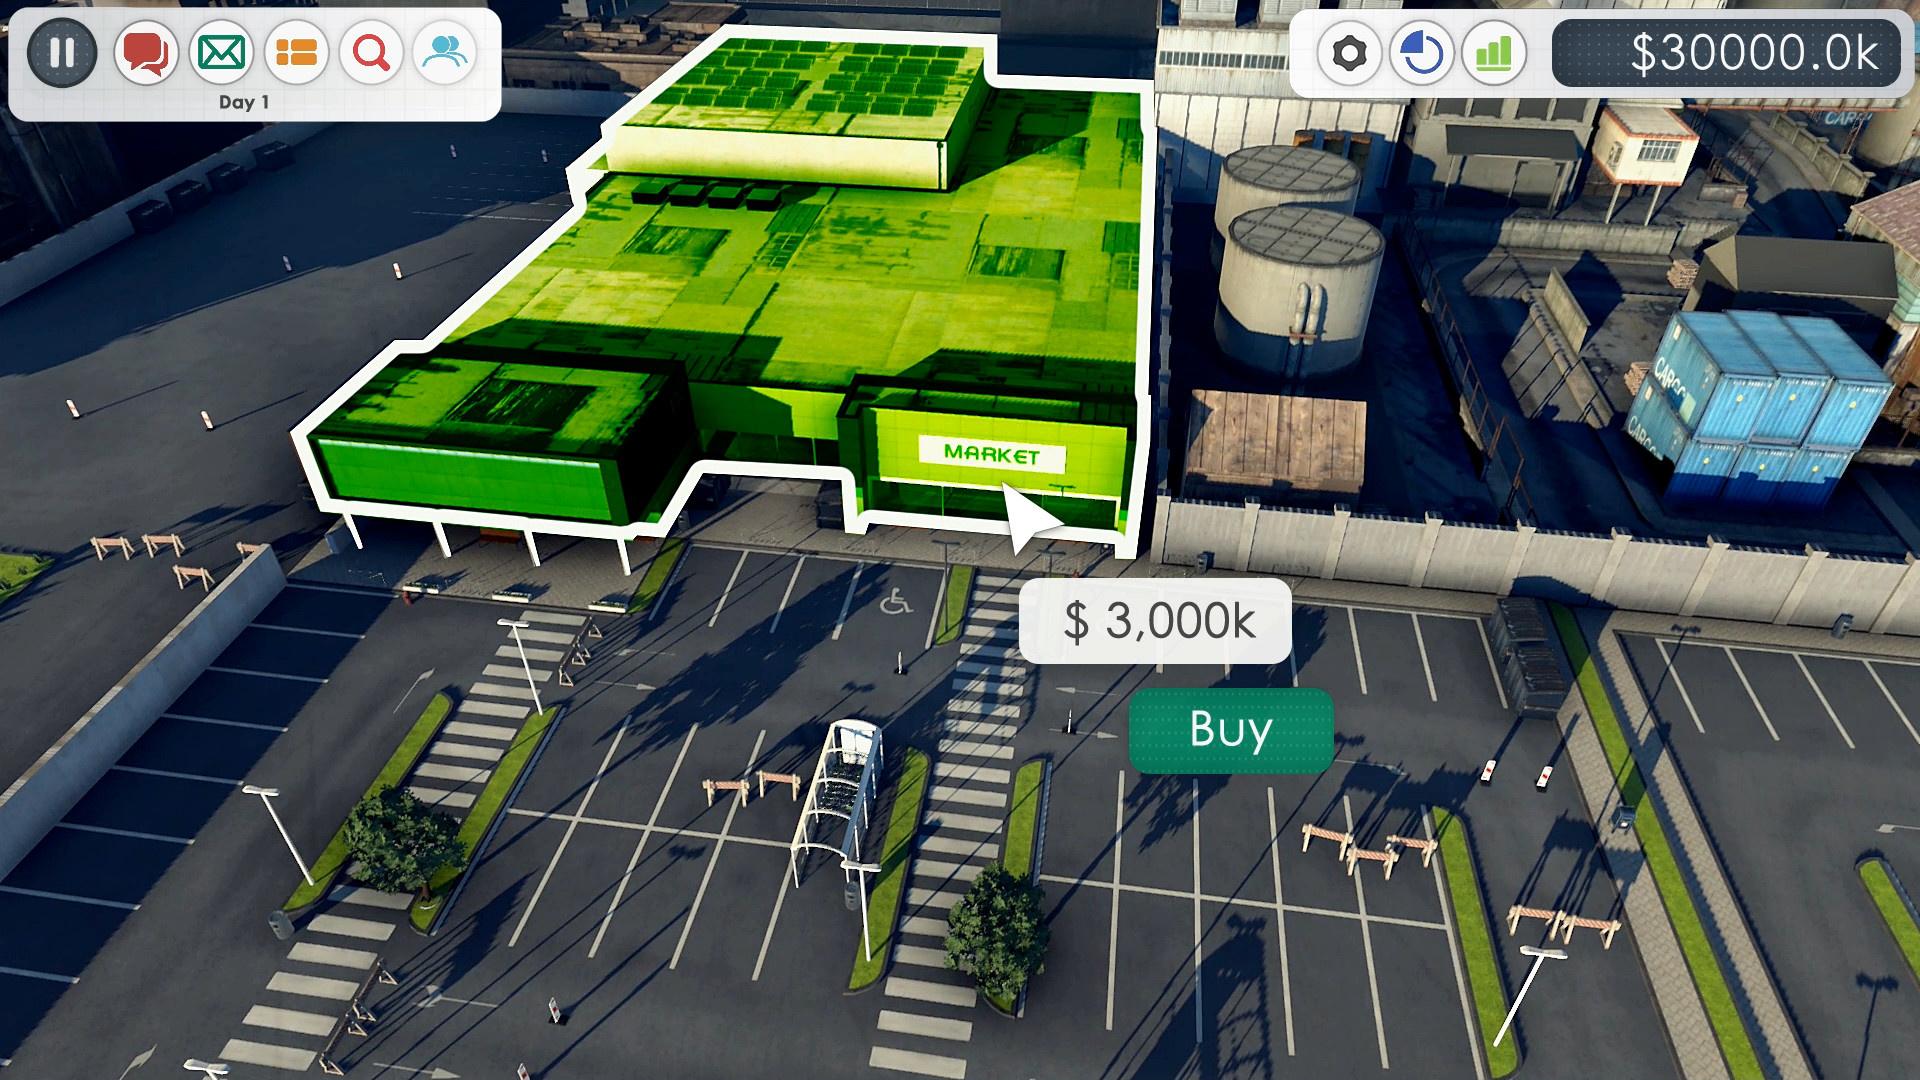 Супермаркет моей мечты: PlayWay анонсировала Supermarket Manager